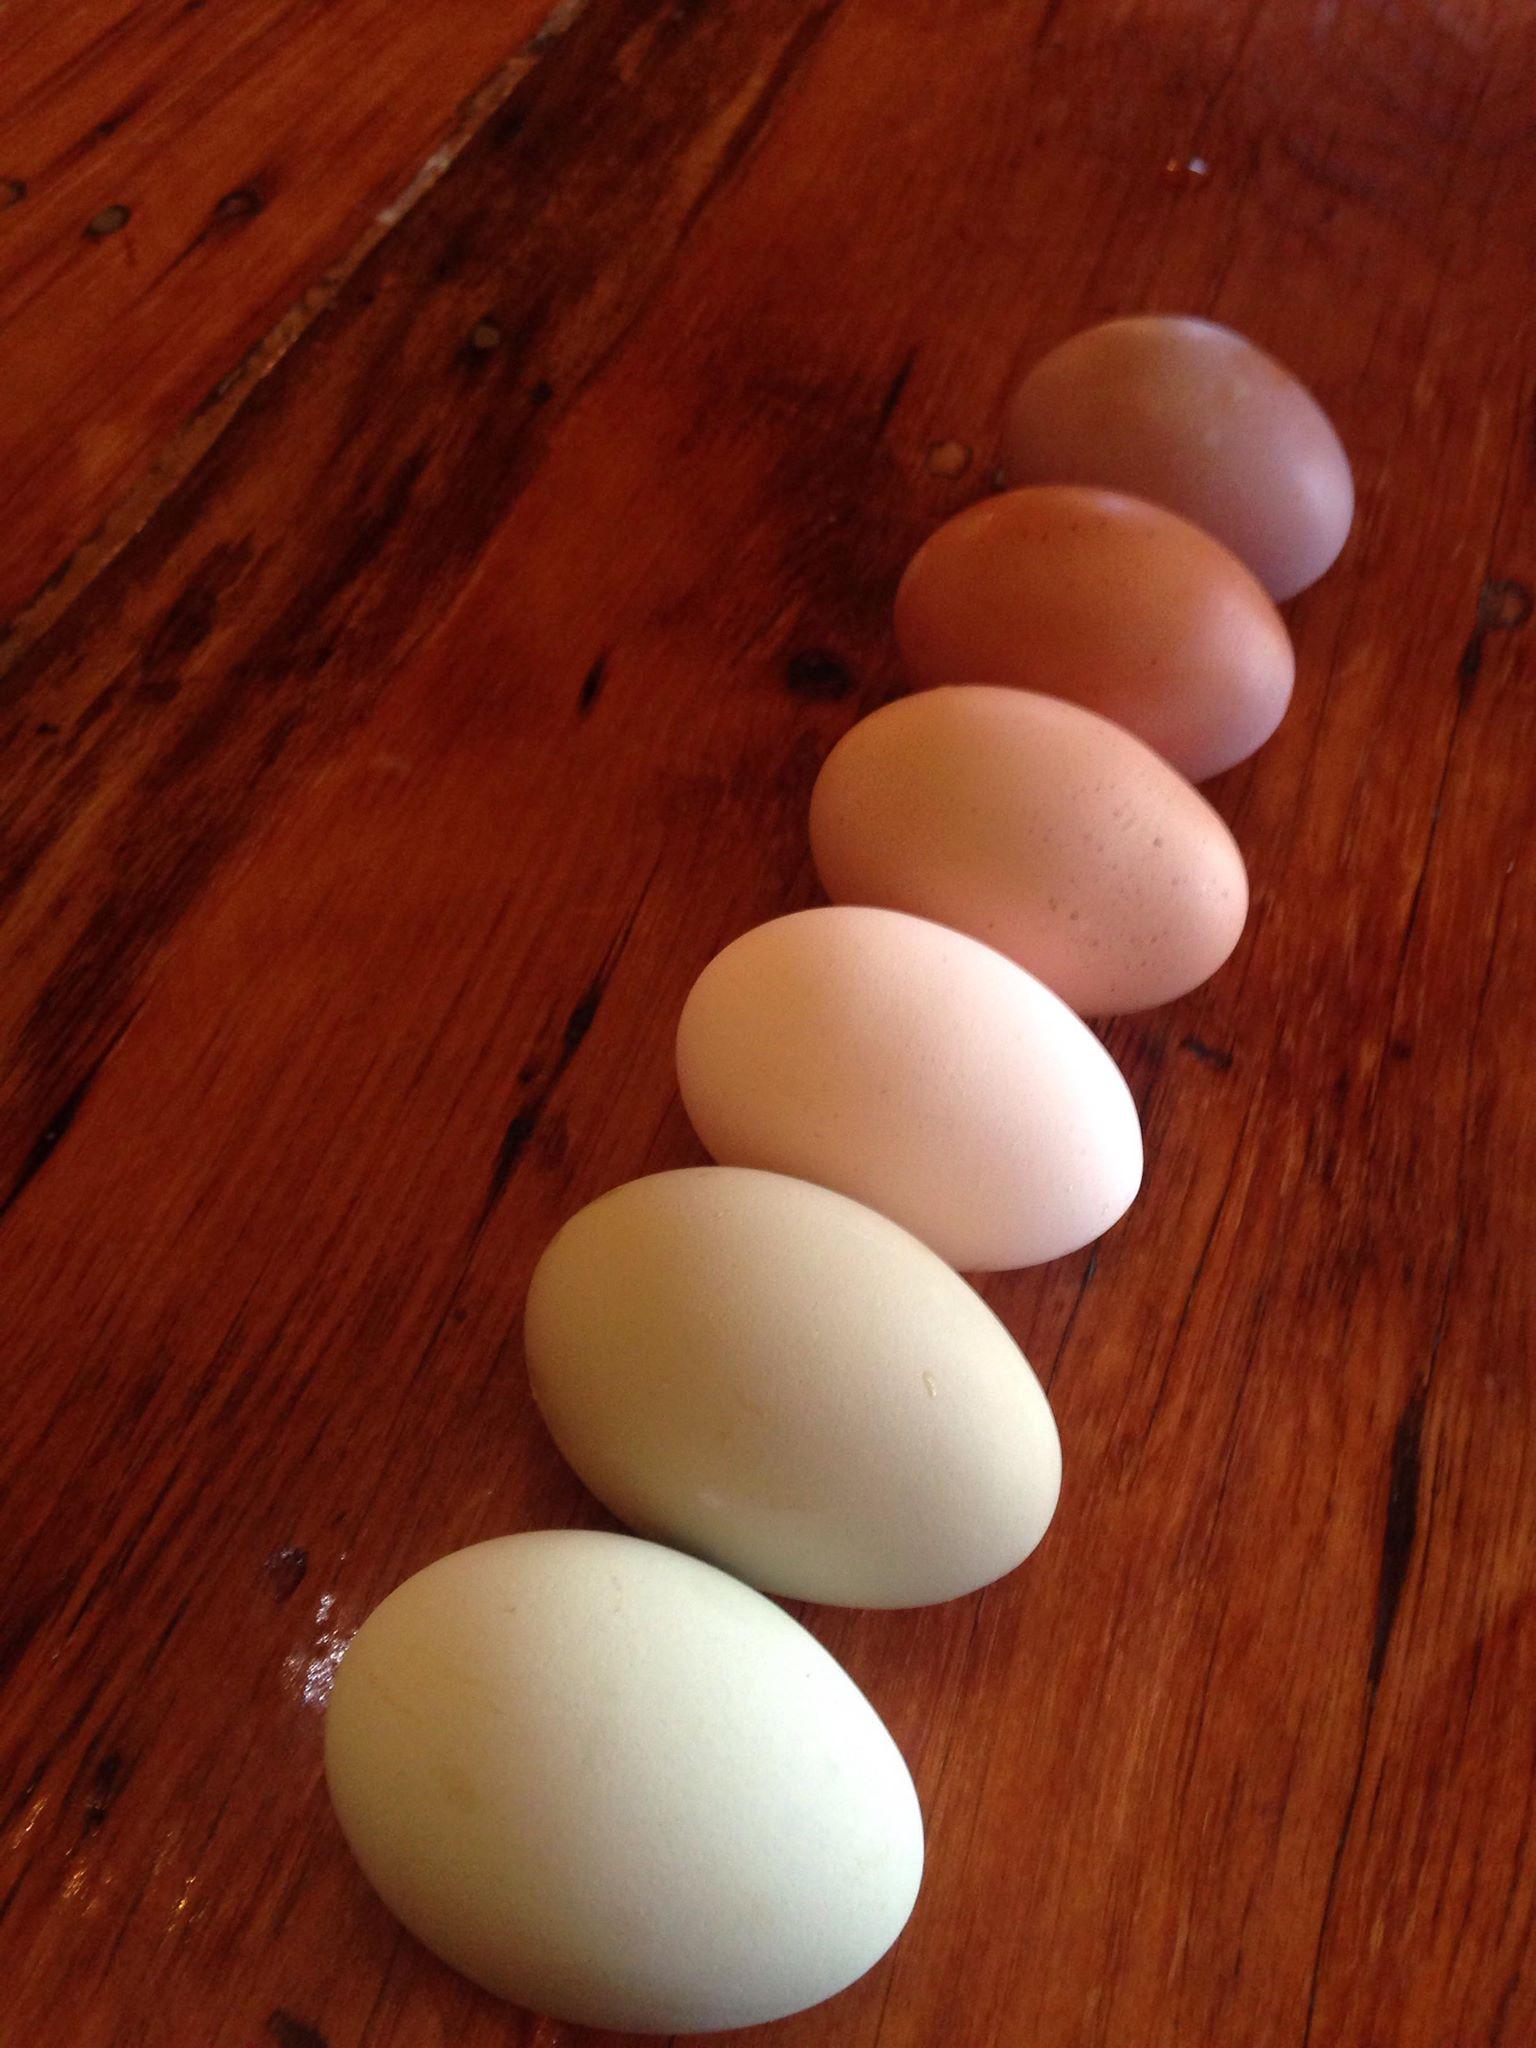 Pastured Eggs - Dozen